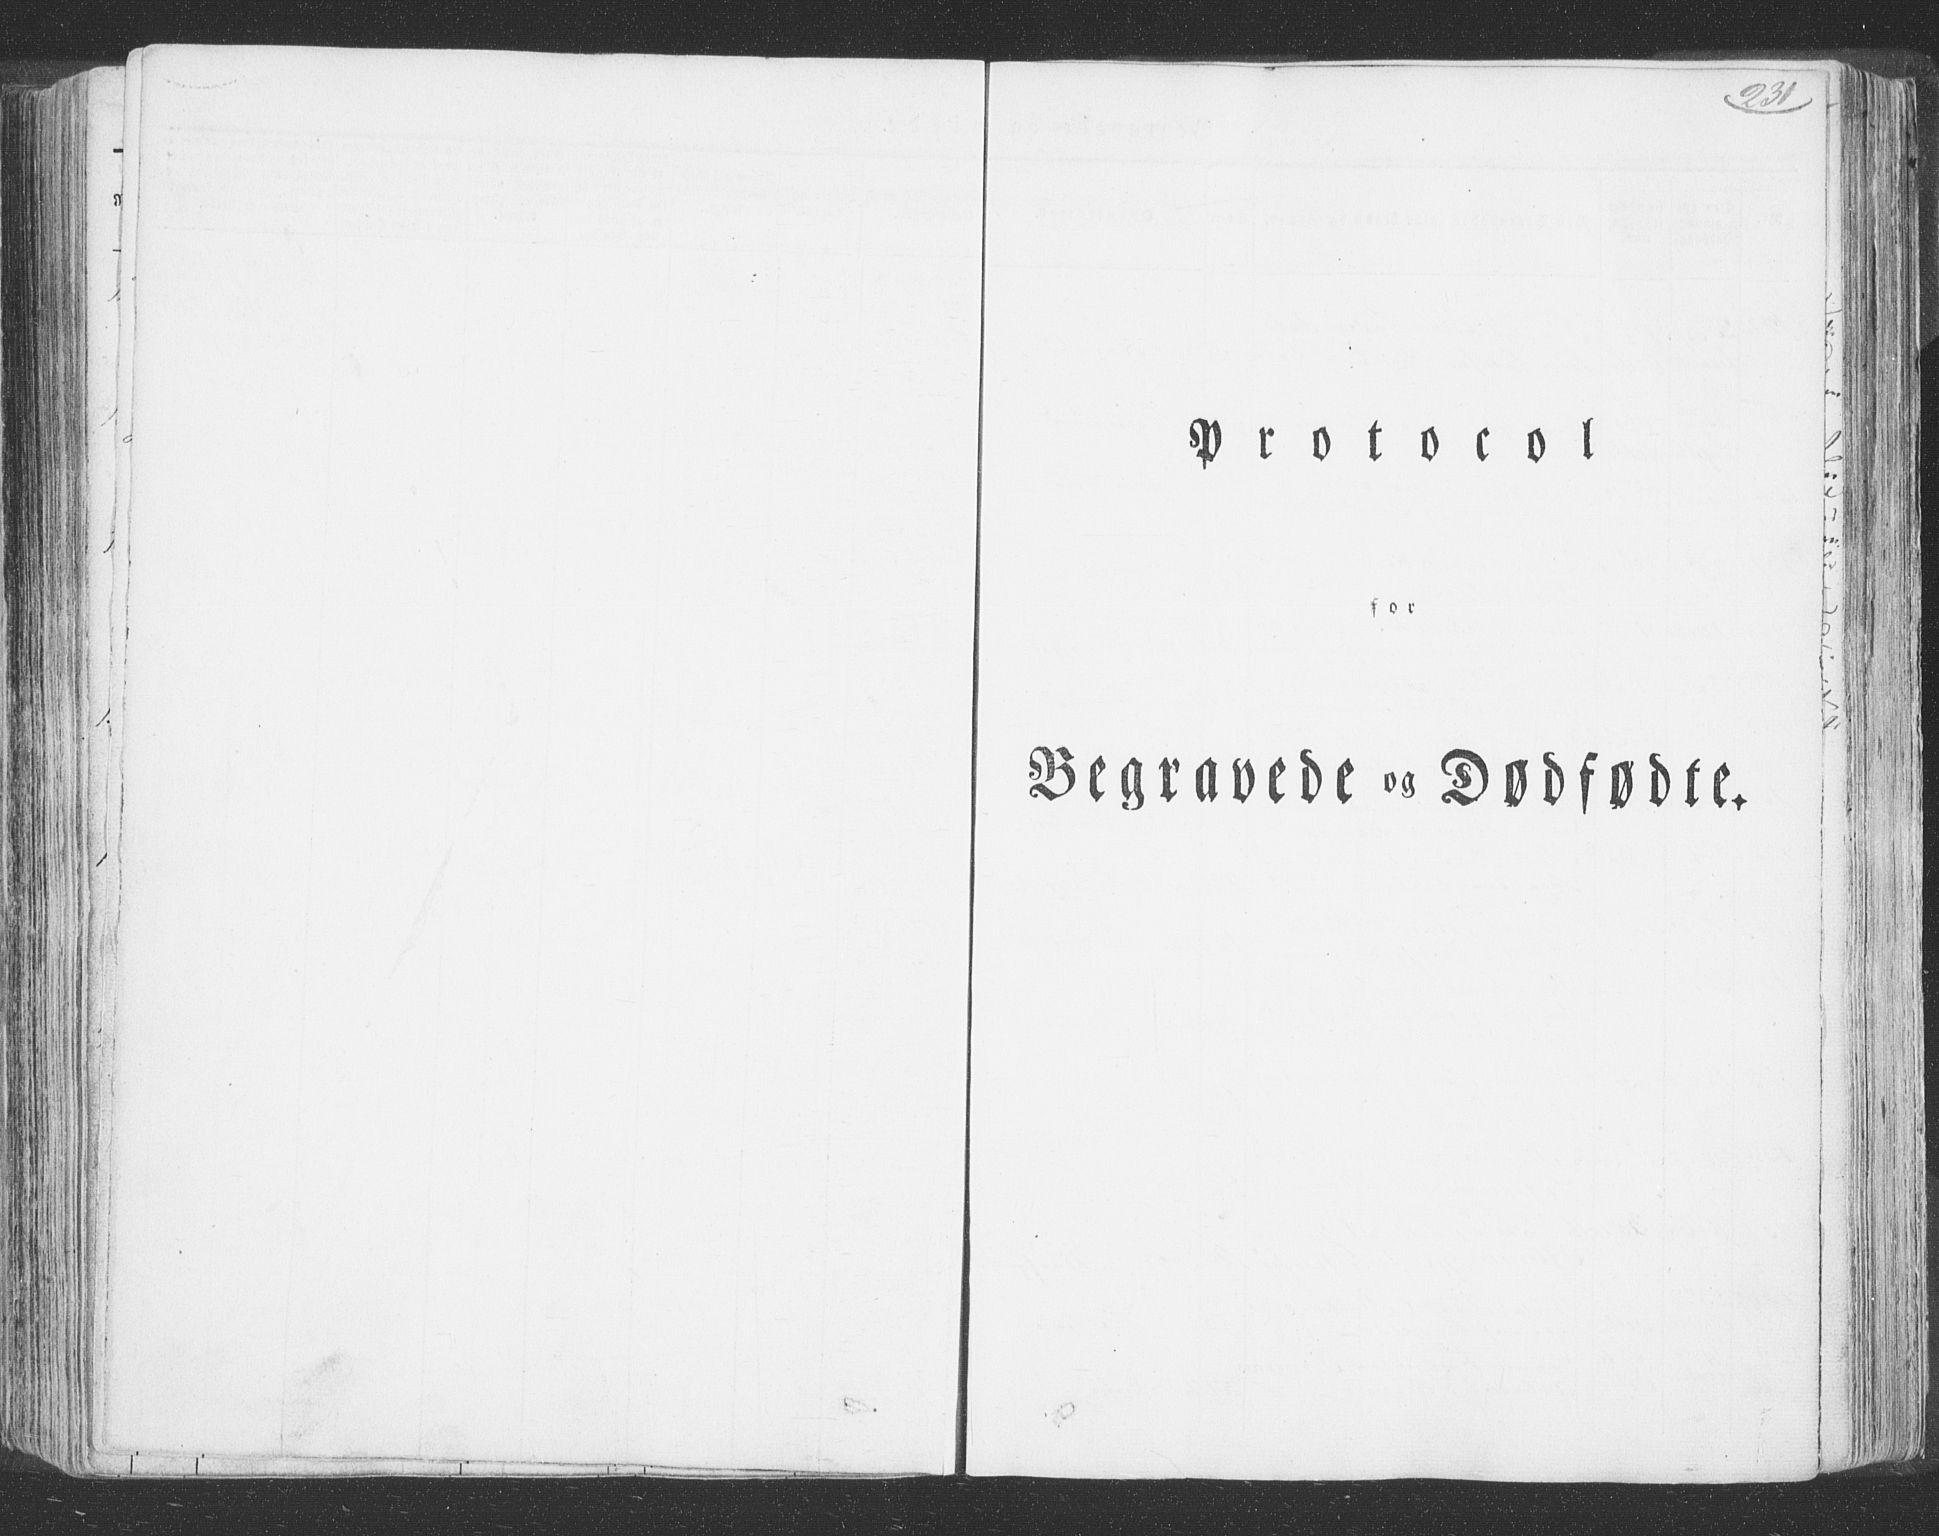 SATØ, Talvik sokneprestkontor, H/Ha/L0009kirke: Ministerialbok nr. 9, 1837-1852, s. 231